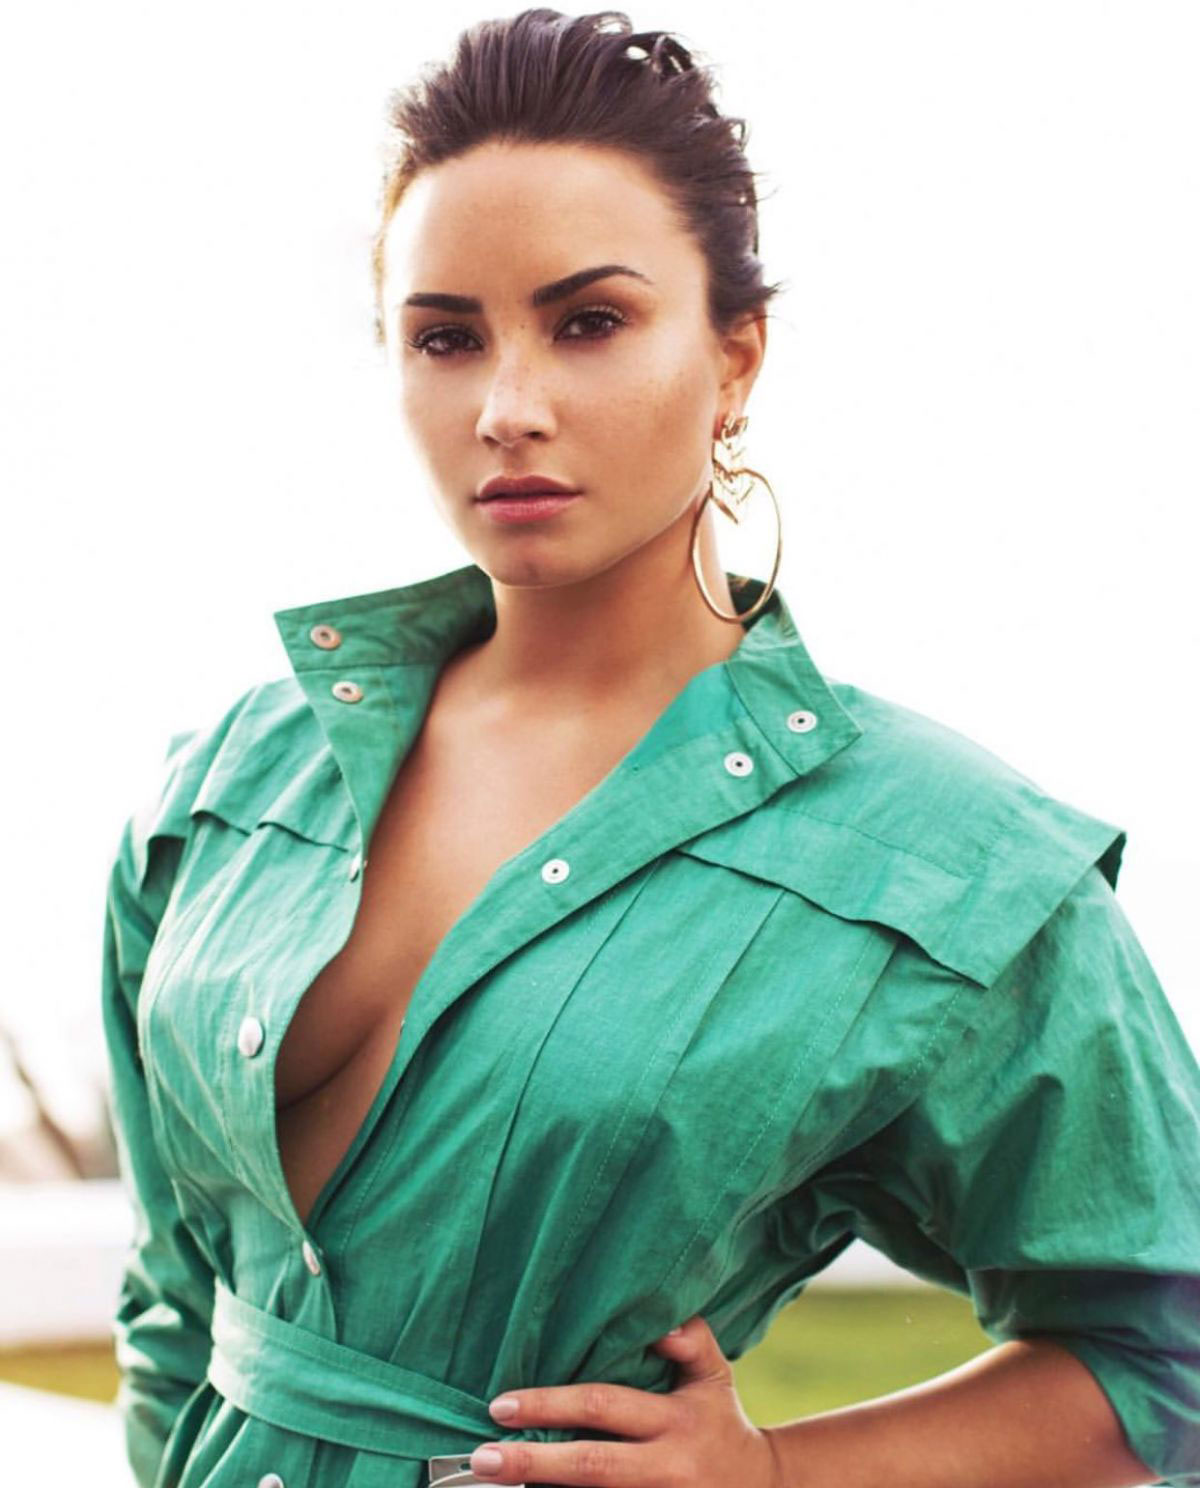 Celebrity Photoshoot - Demi Lovato by Angelo Kritikos ...